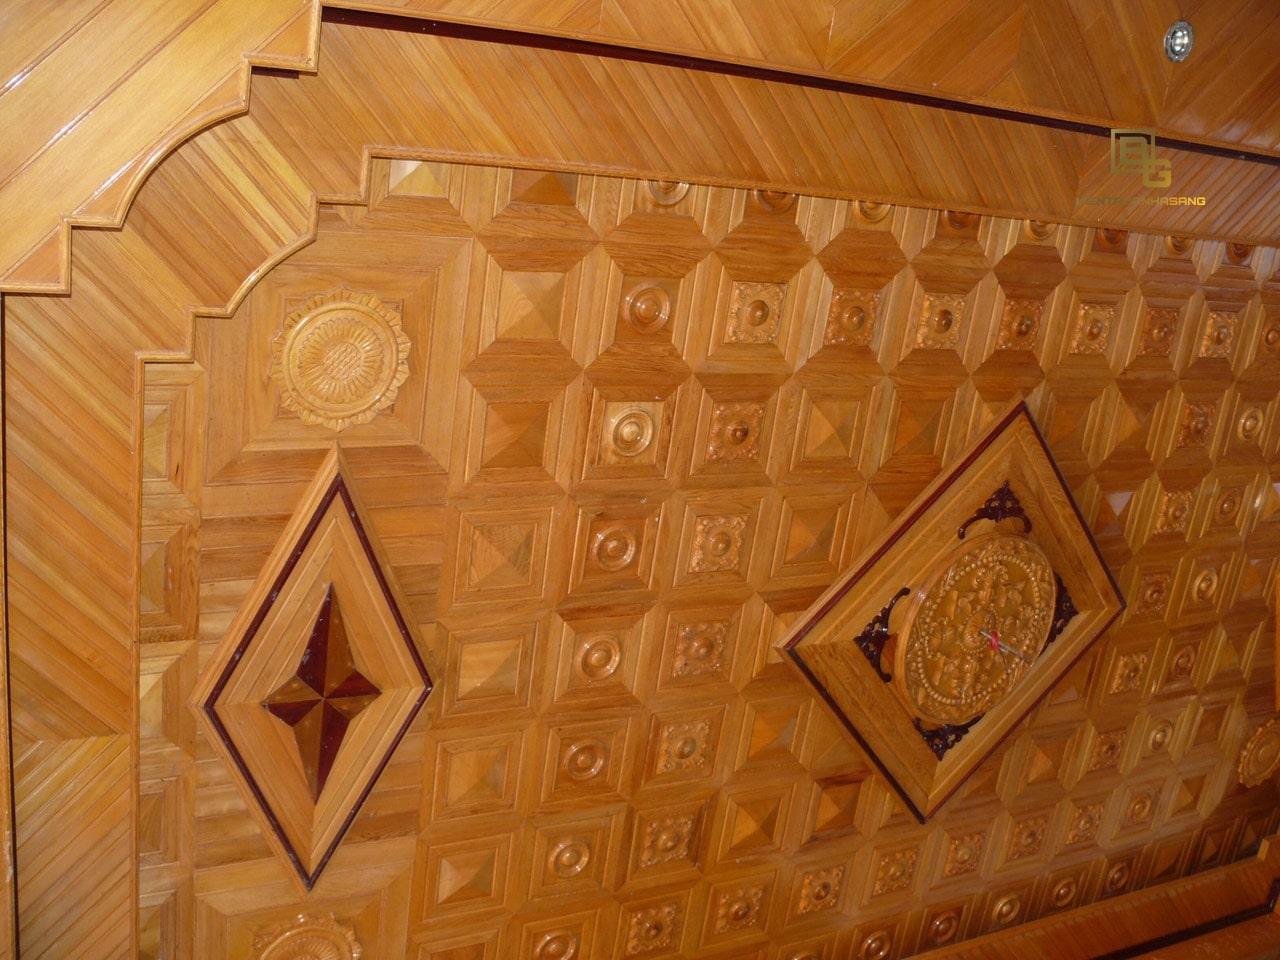 Mẫu trần gỗ Pơ Mu đẹp